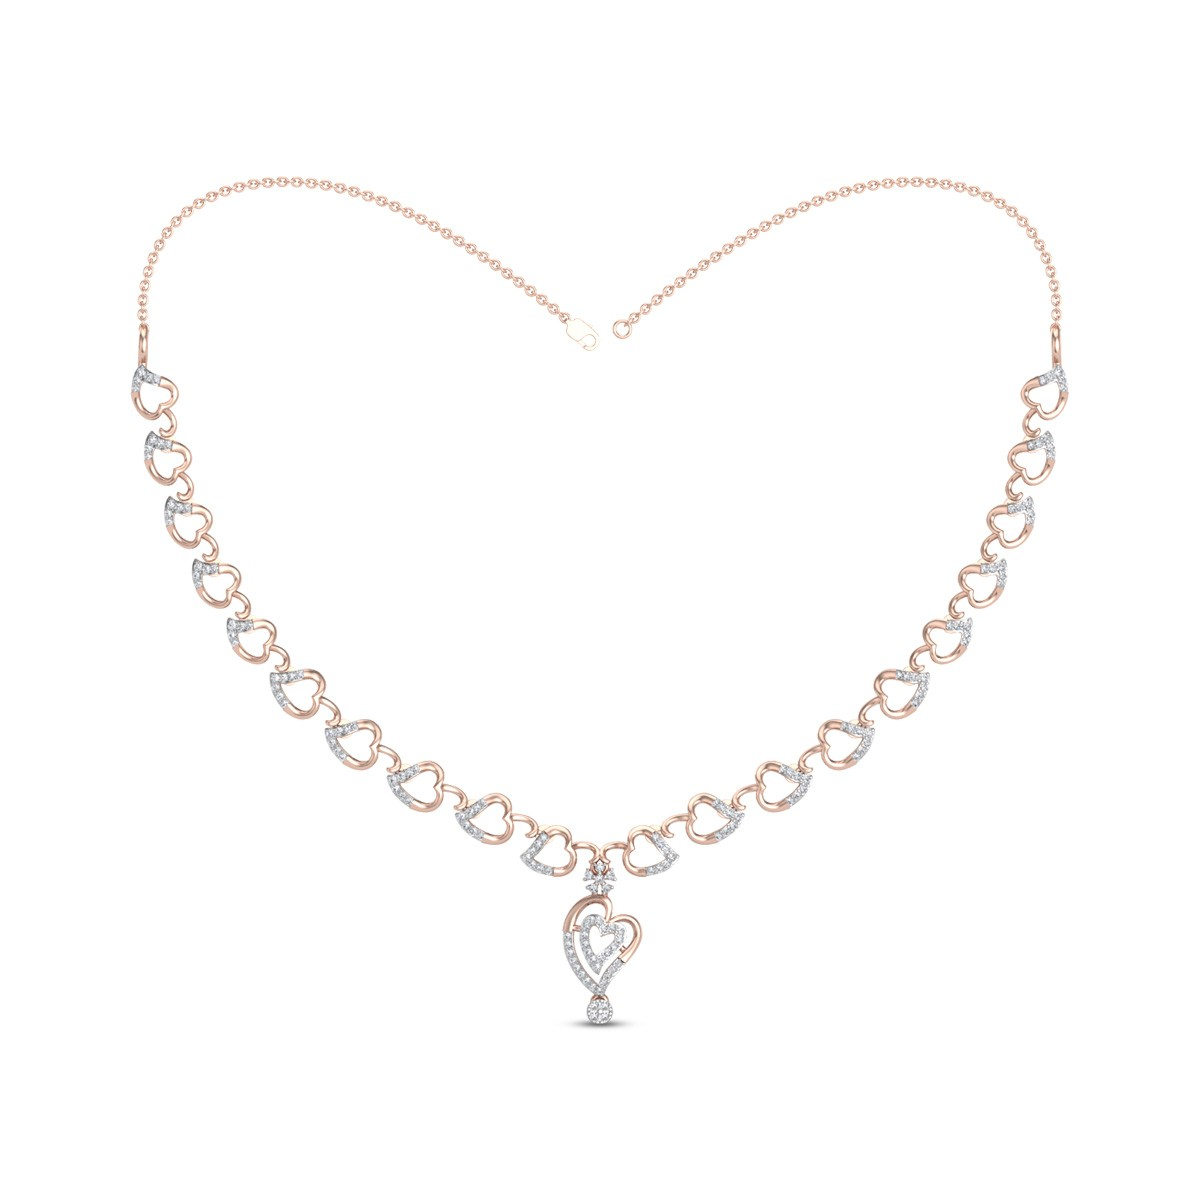 Diamond Necklace DJNC5095